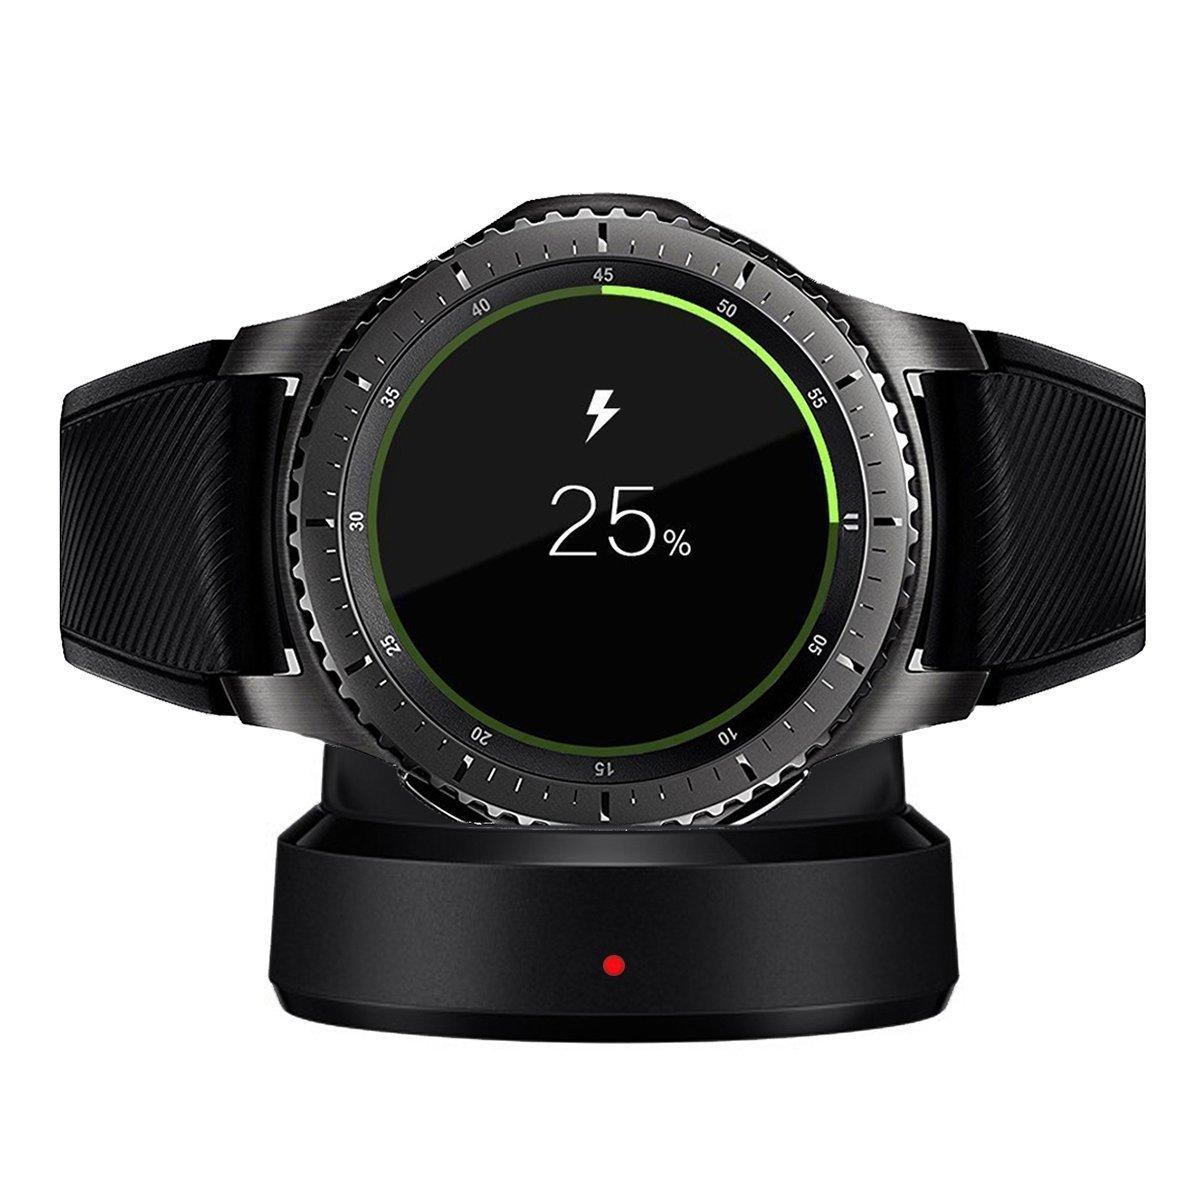 BP005 S3 old models watch wireless charging (13).jpg